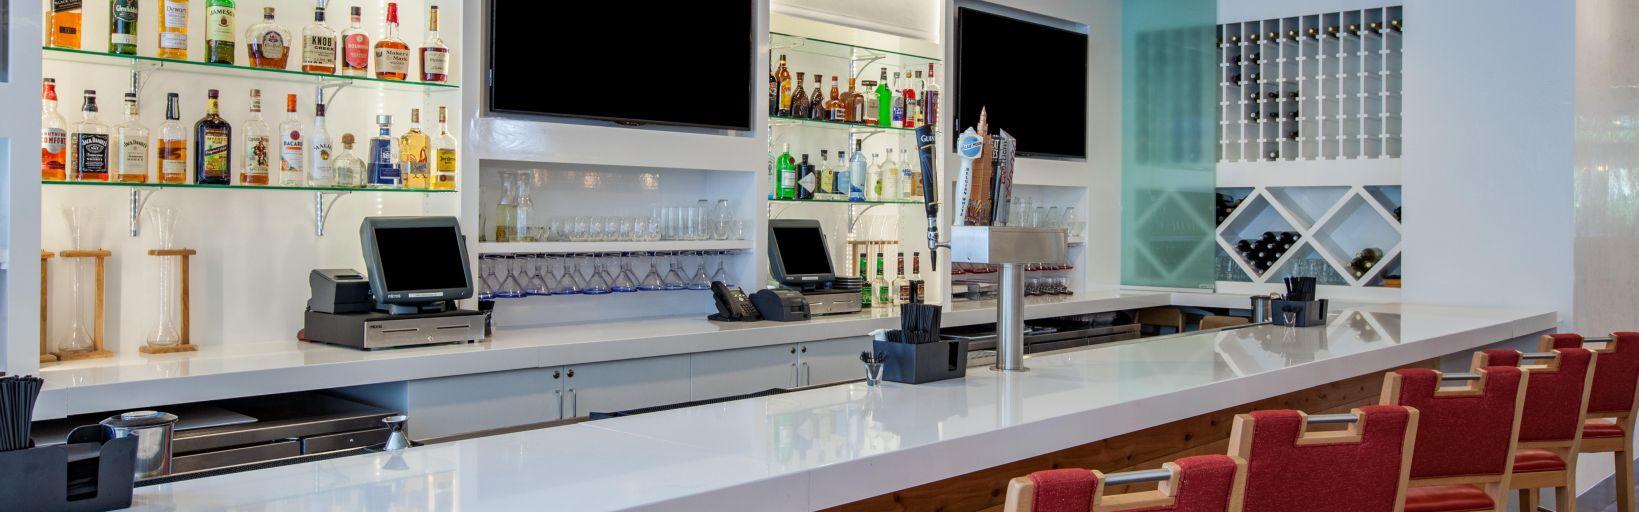 Bar And Lounge Café Restaurant